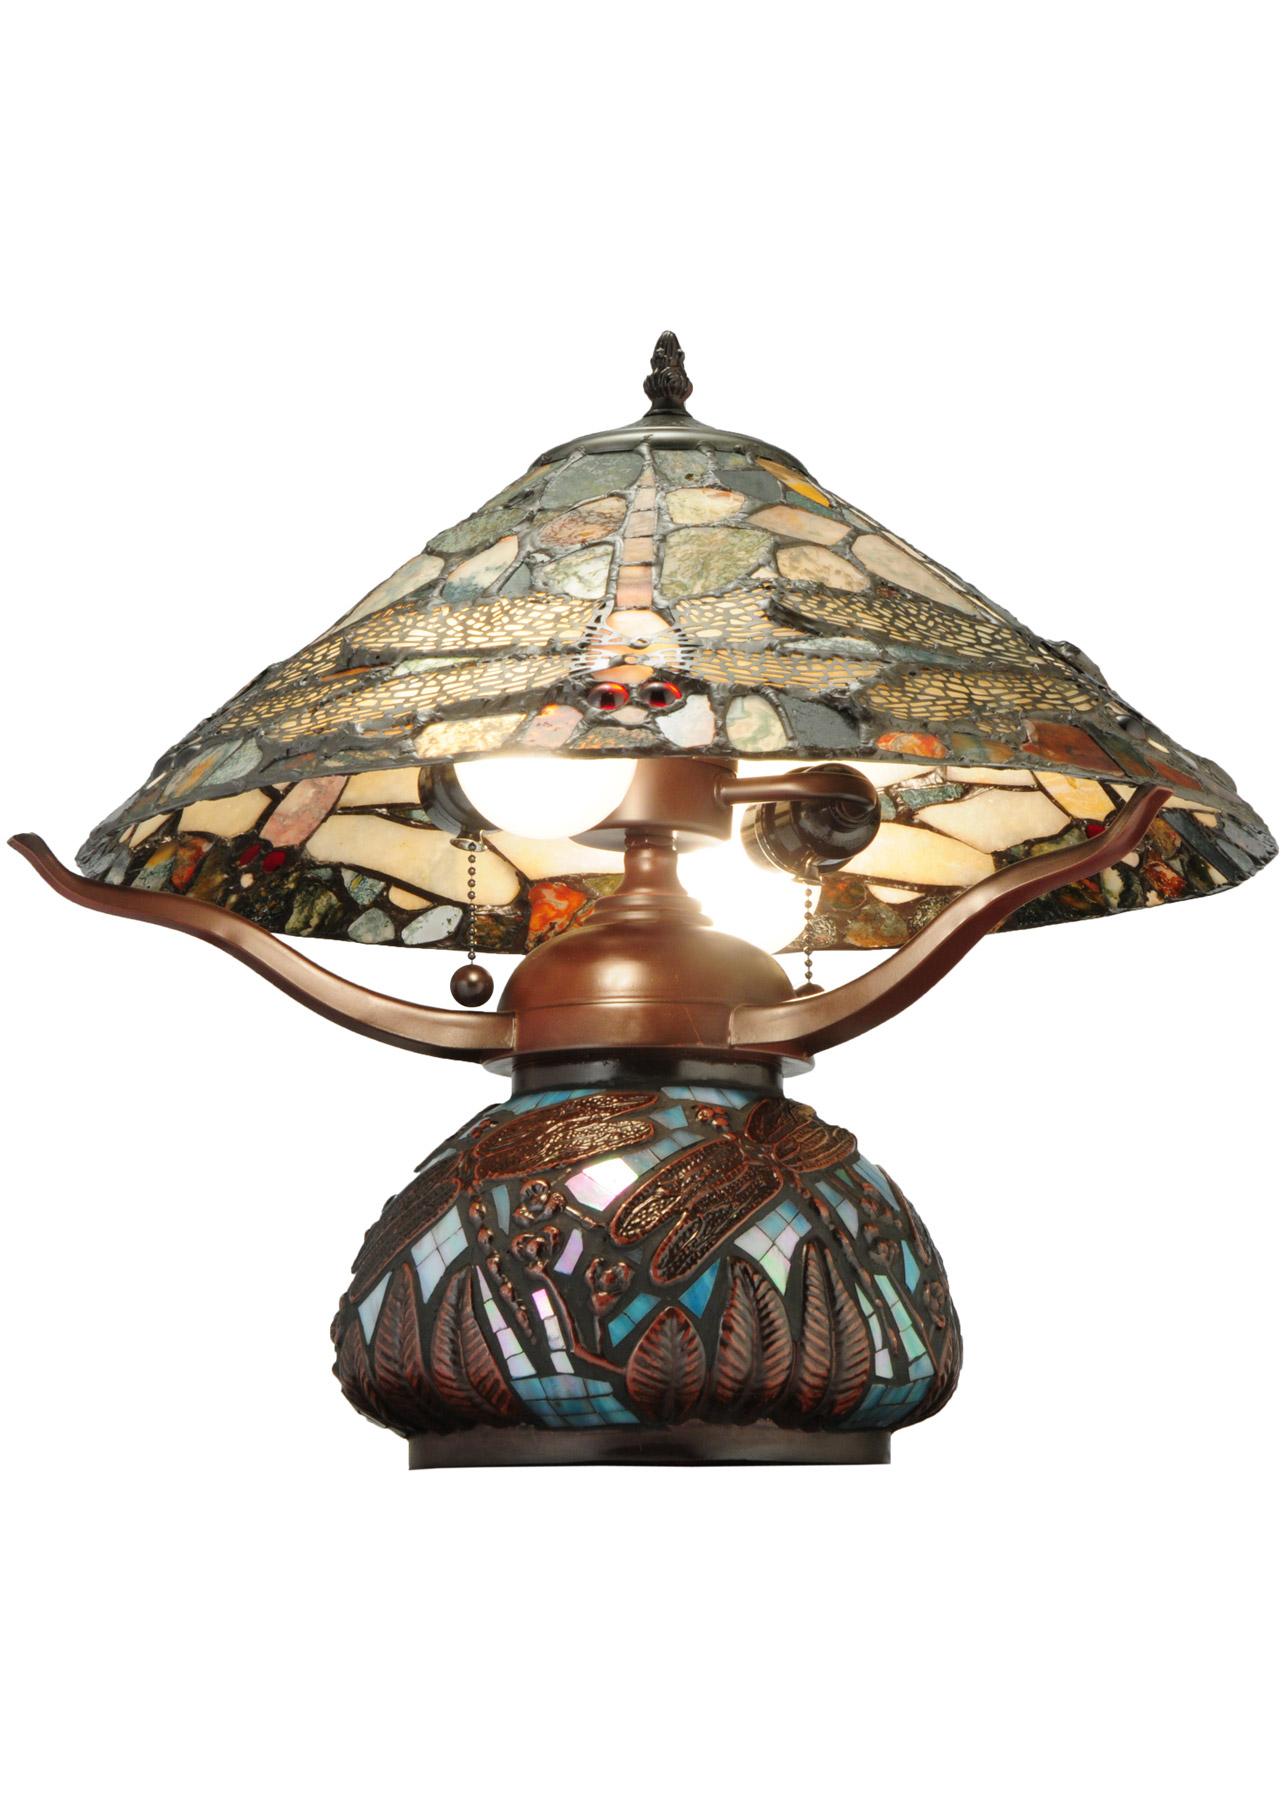 Meyda 138103 Dragonfly Agate Table Lamp